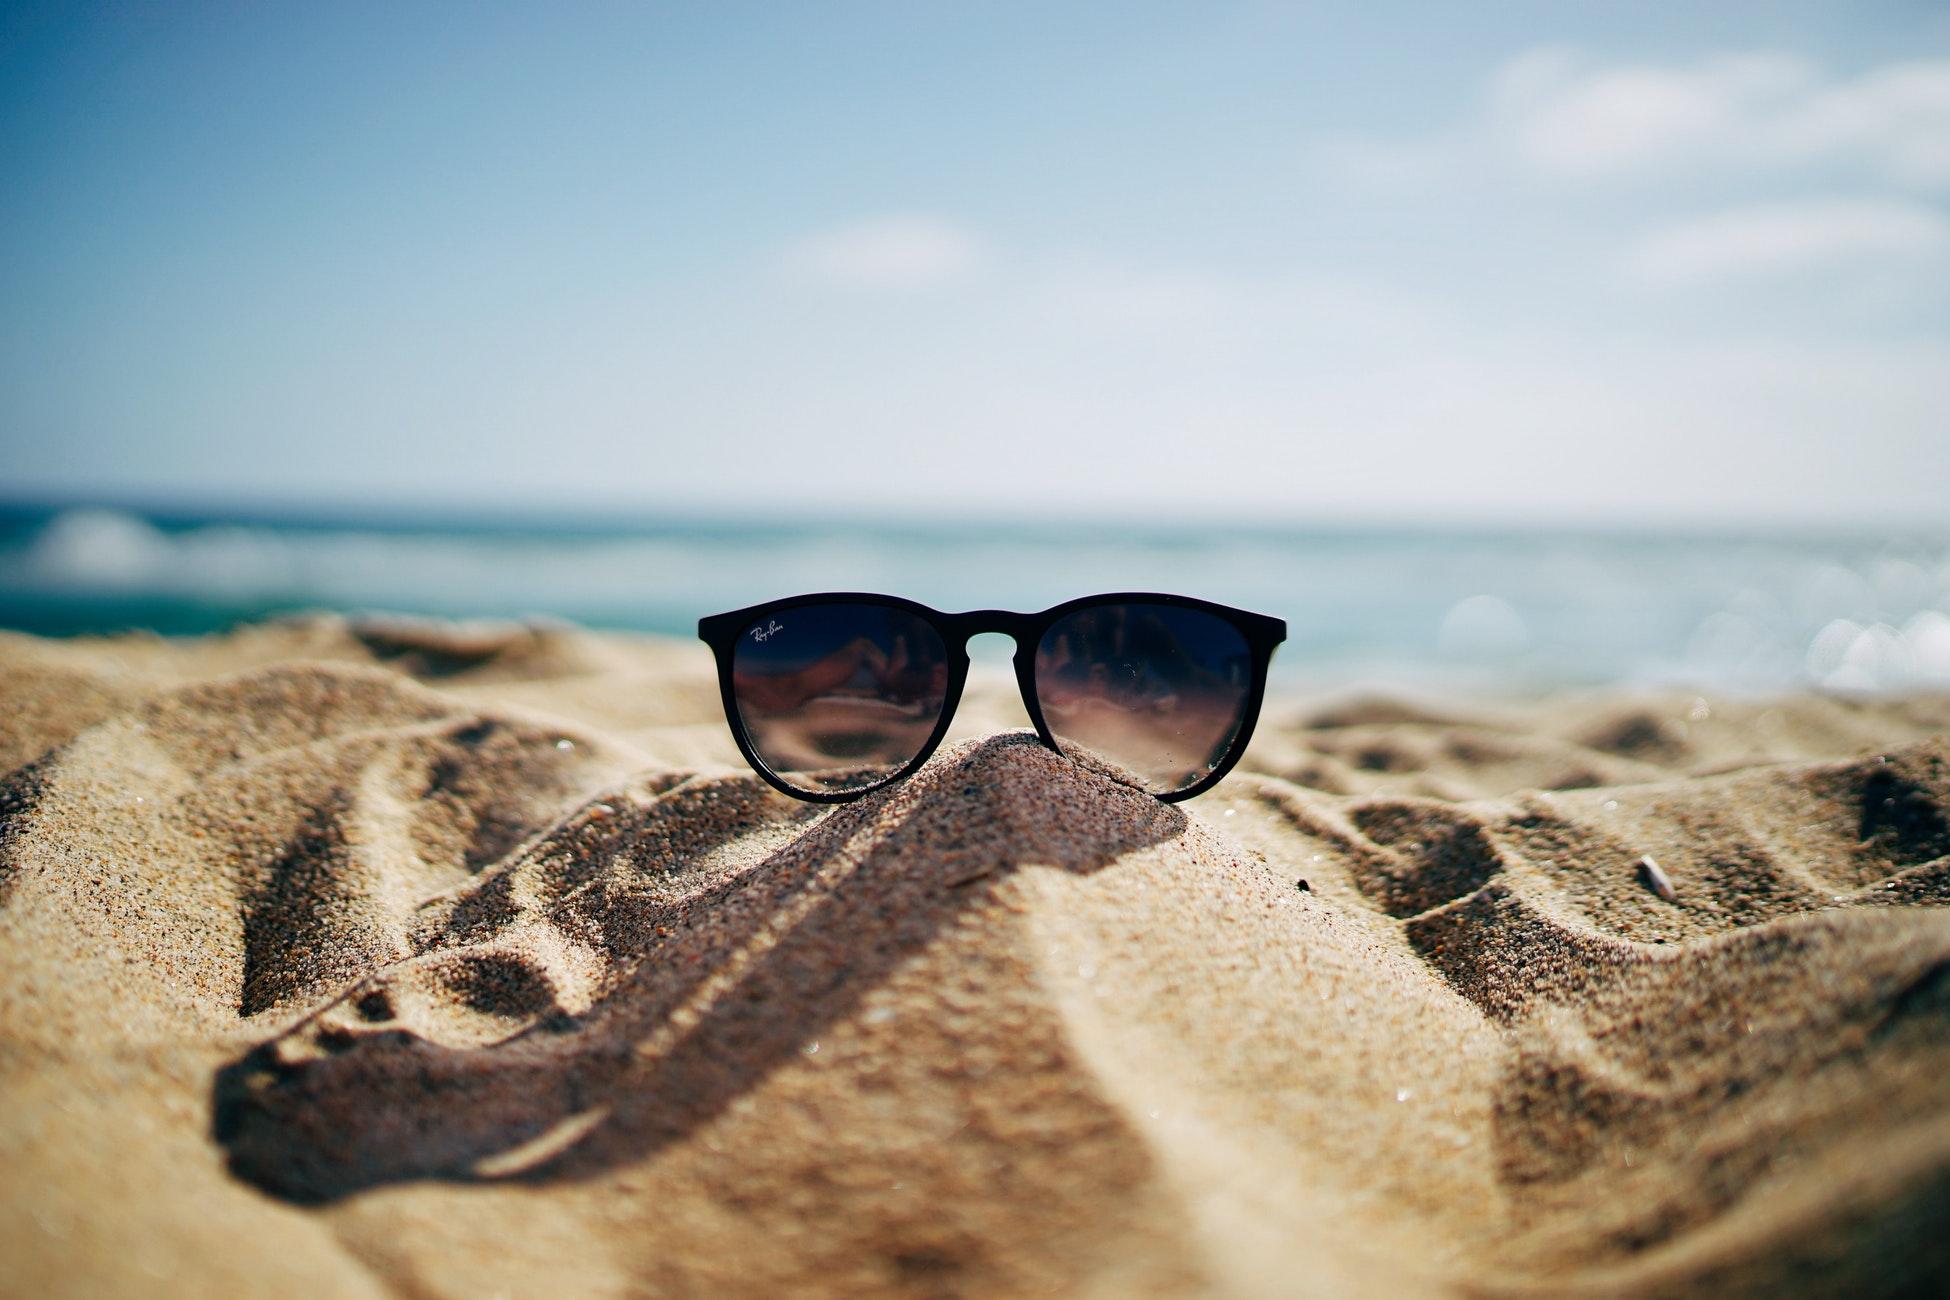 image: sunglasses sitting on sand at beach